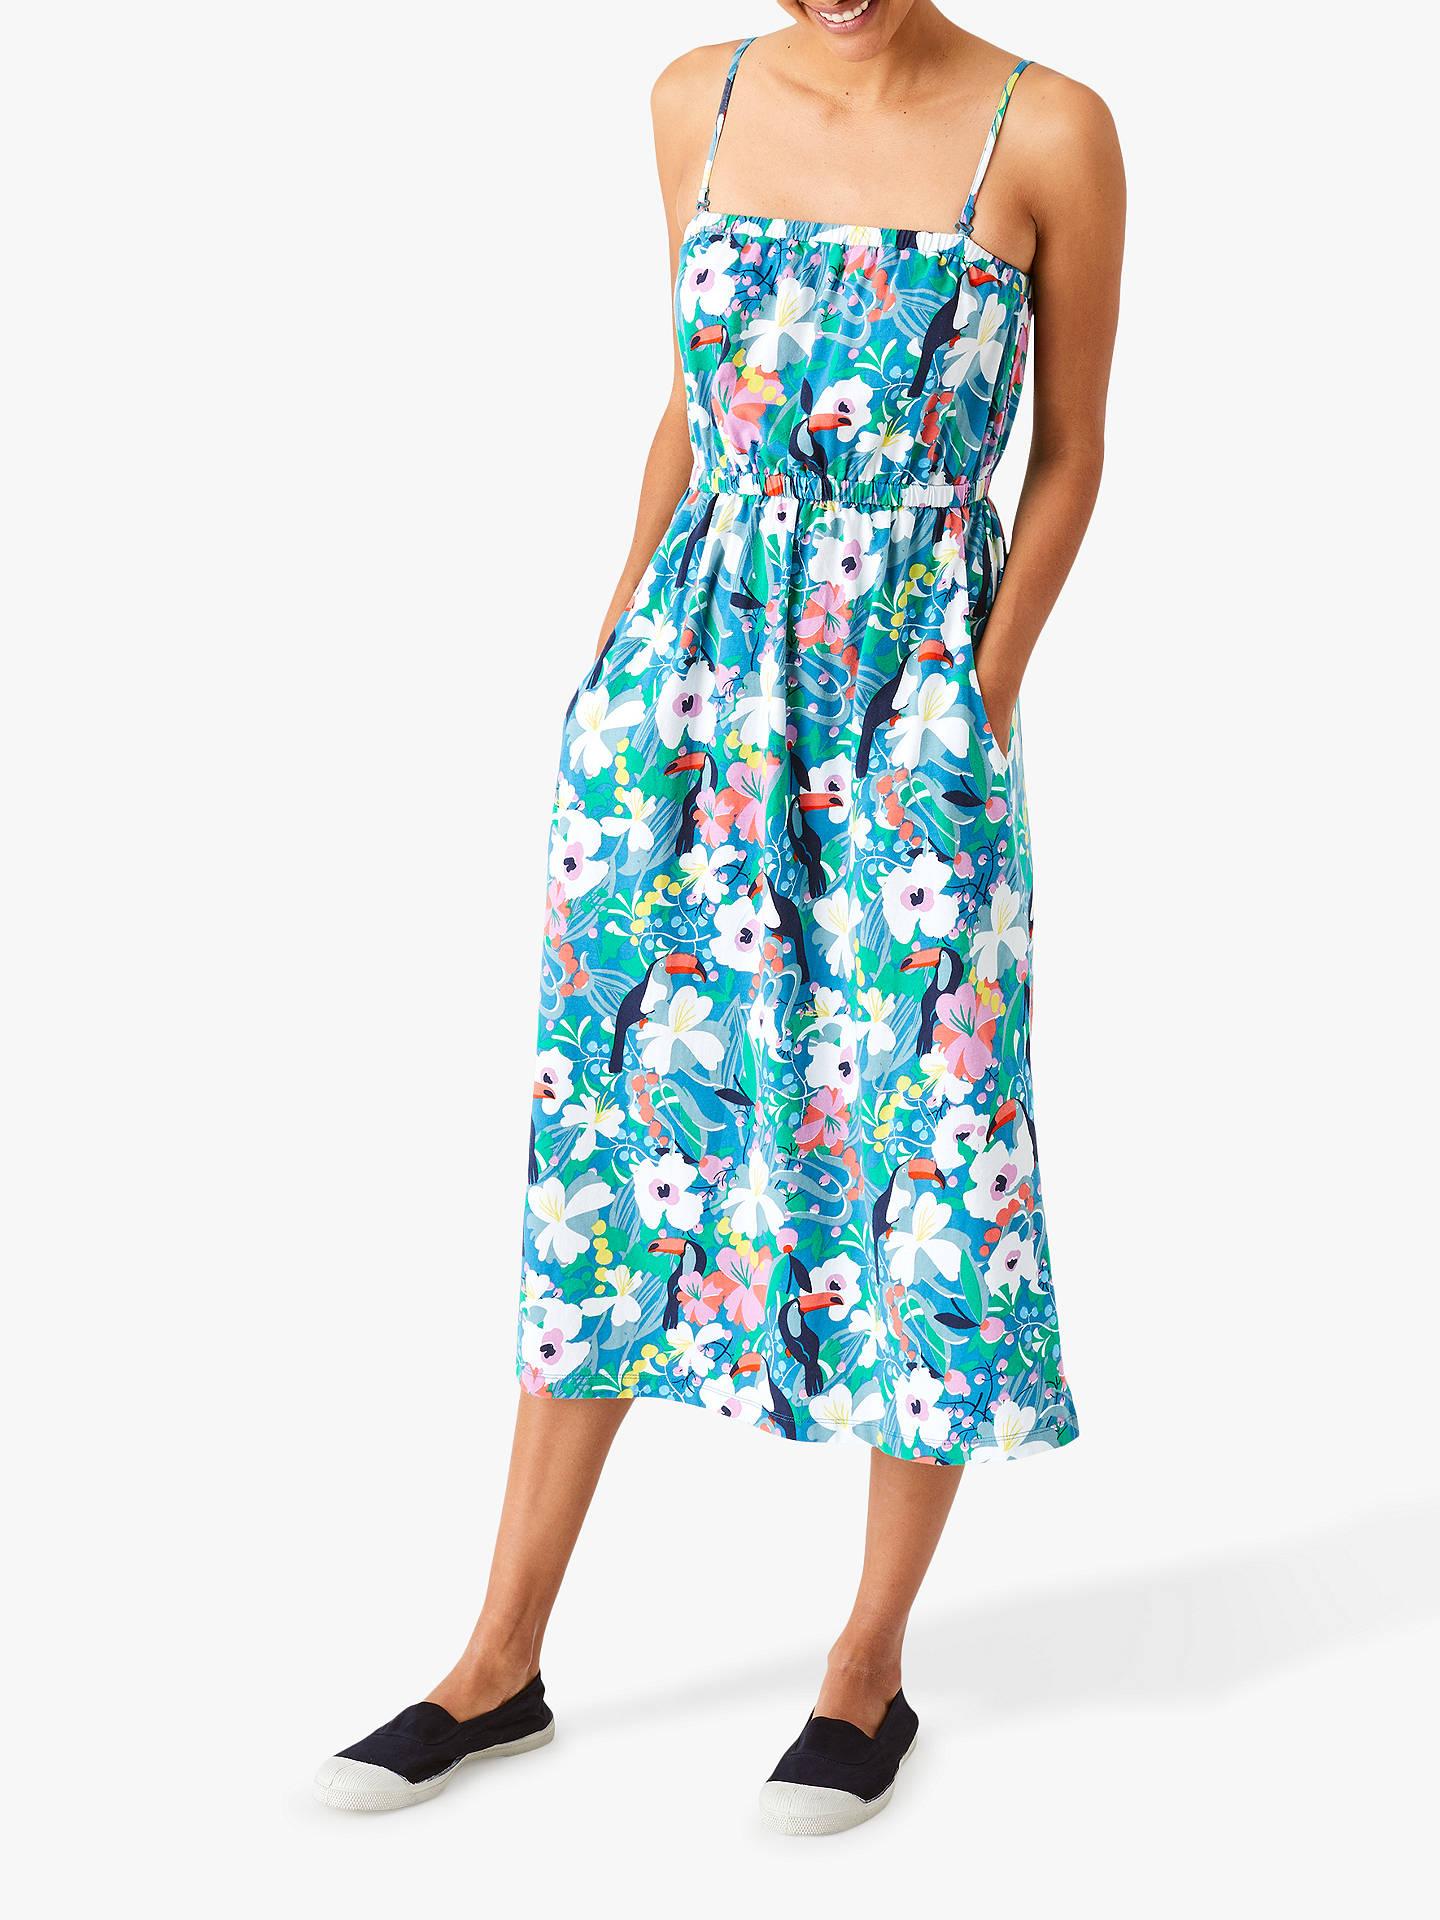 b48c5d7c8cfe7 White Stuff Tropical Toucan Dress, Multi at John Lewis & Partners